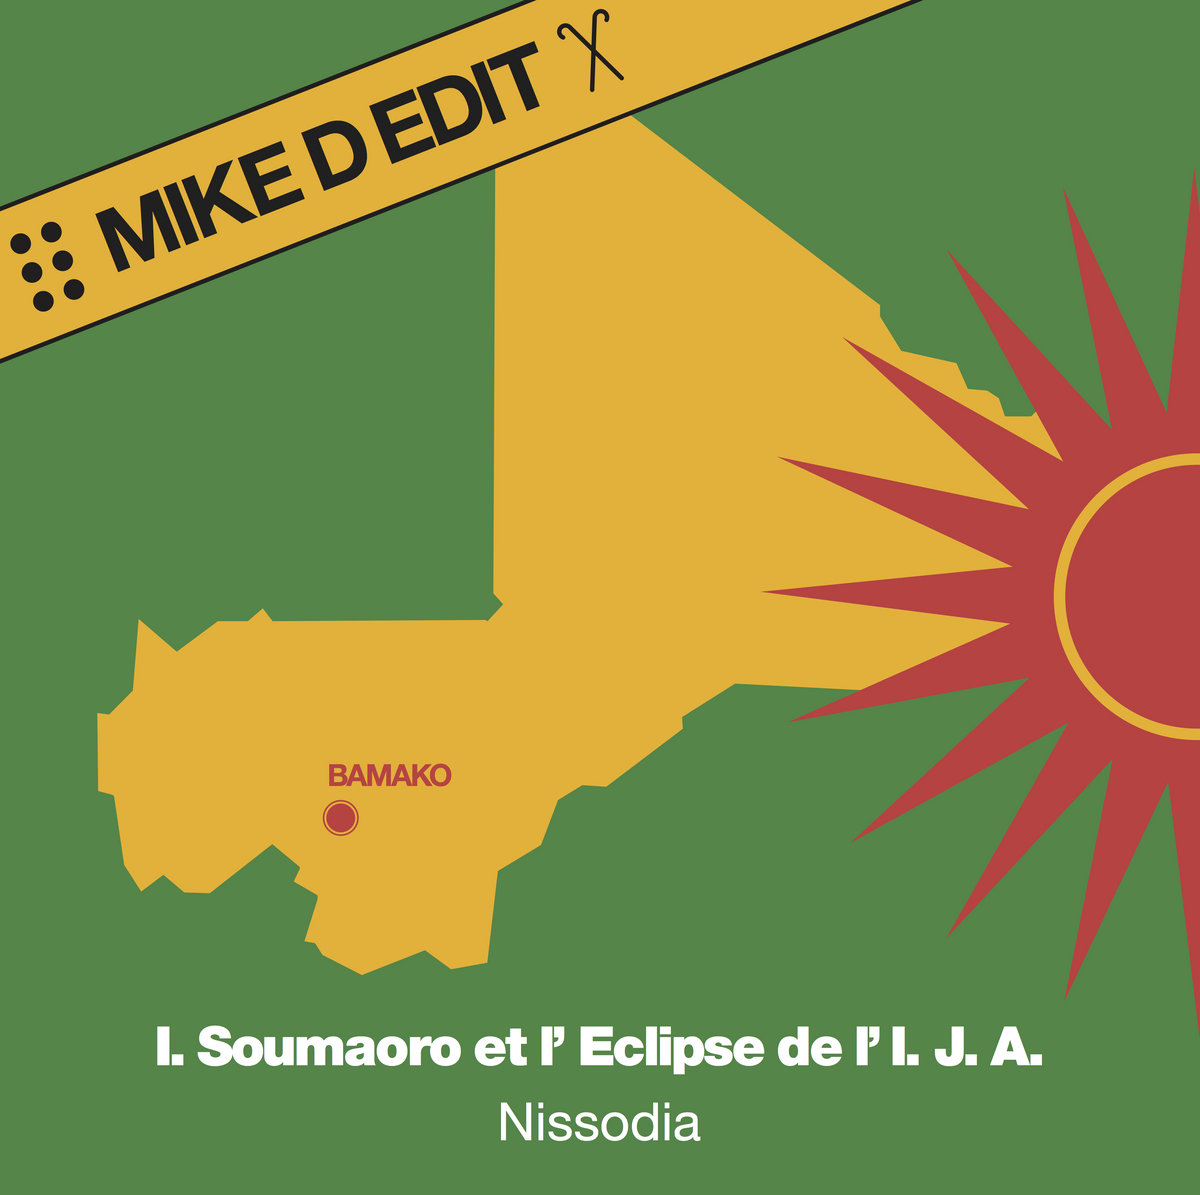 Nissodia (Mike D Edit)